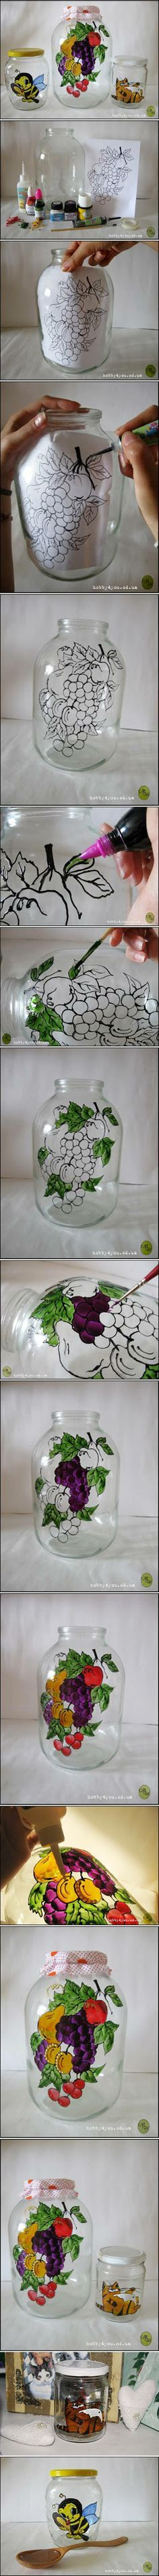 Pintura en cristal